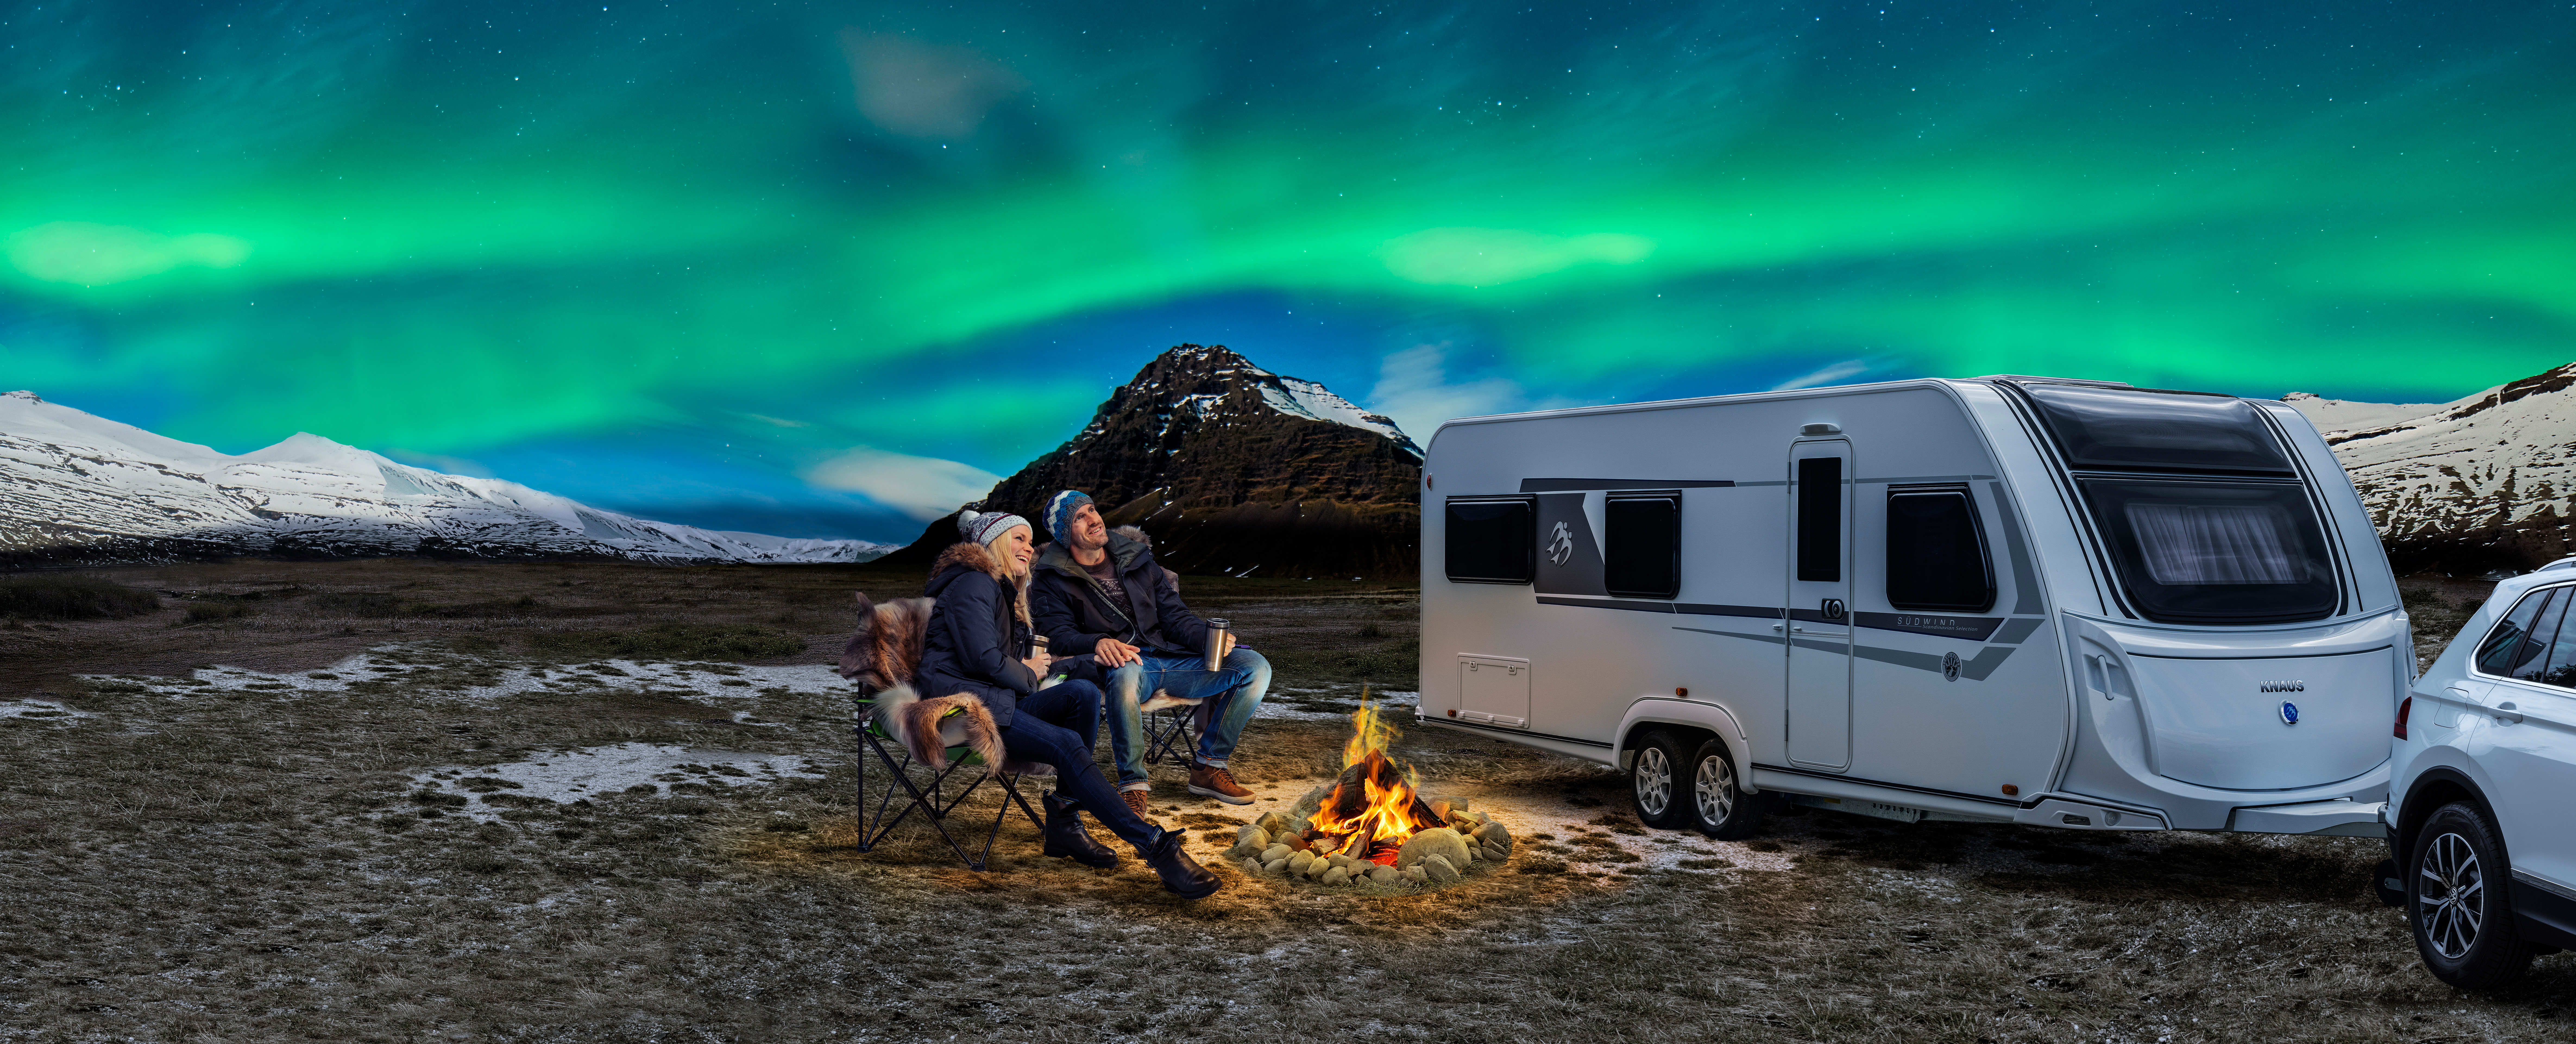 Ongebruikt Freedom redefined: more power for caravan owners - Bosch Media Service TM-94